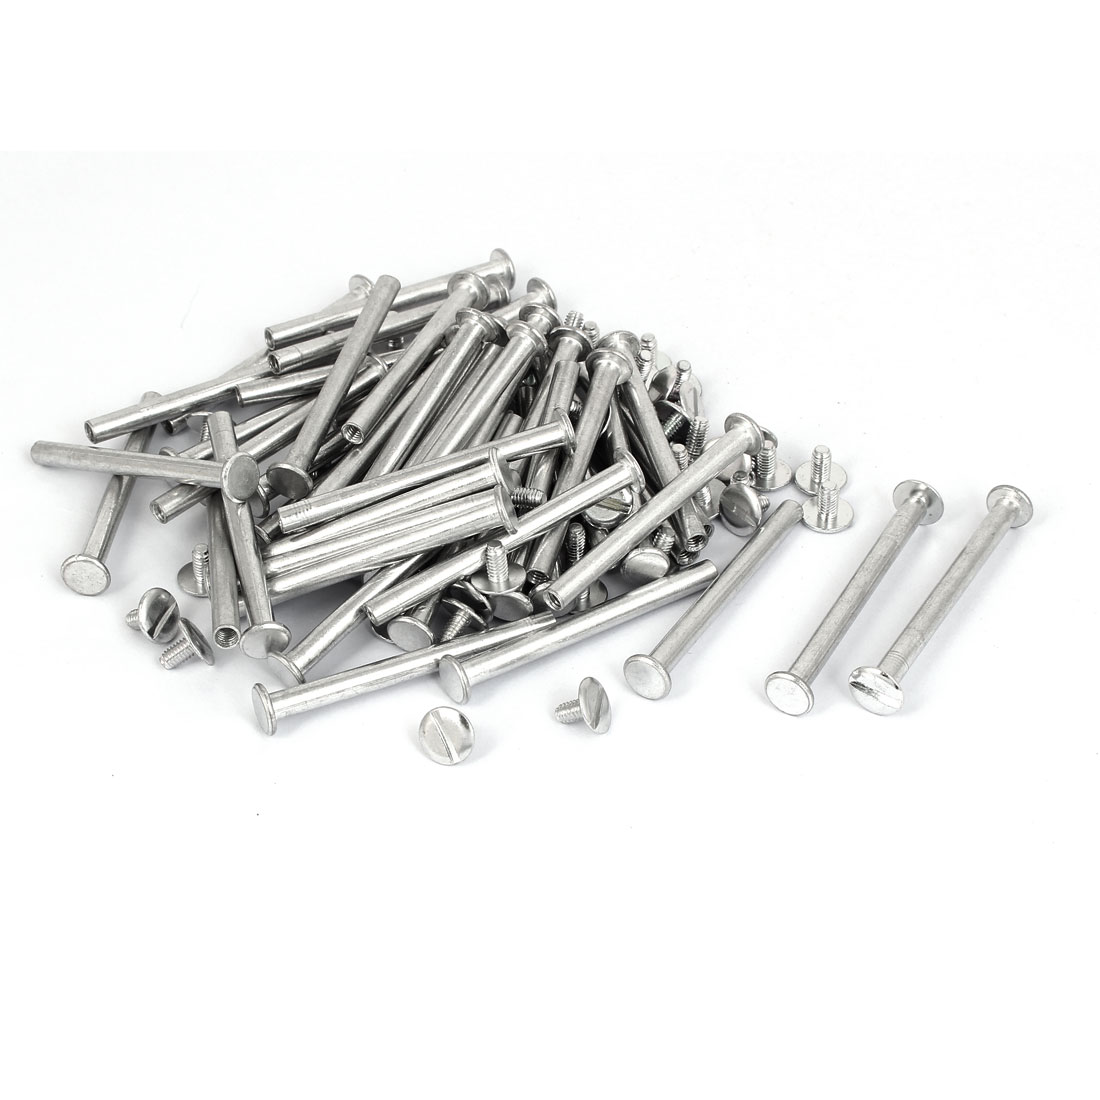 M5x55mm Aluminum Binding Screw Post 50pcs for Photo Albums Scrapbook